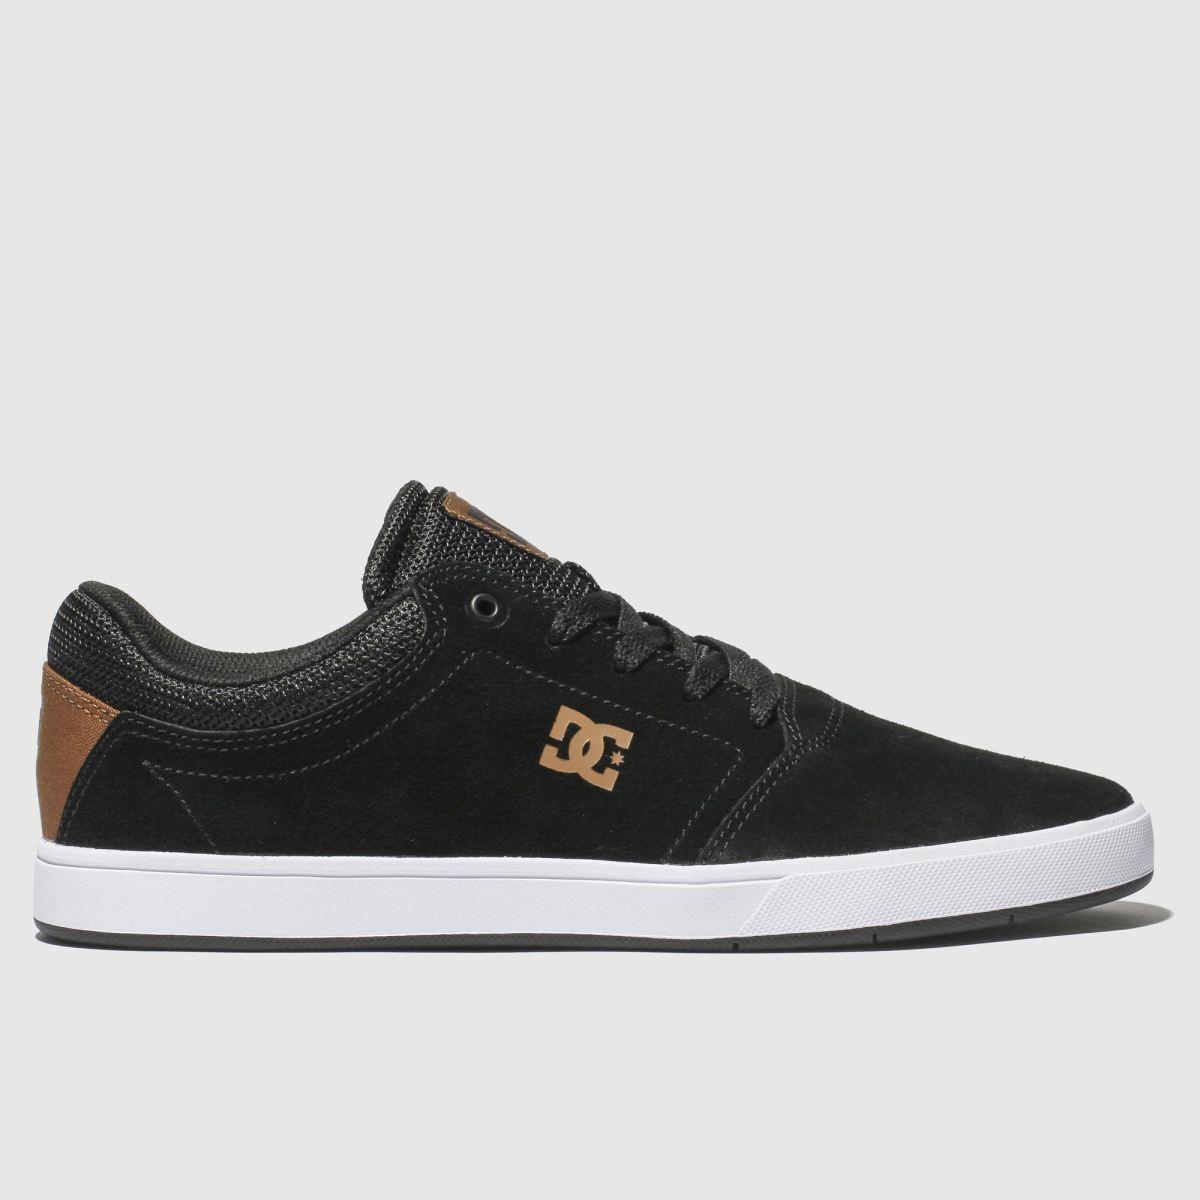 Dc Shoes Black & White Crisis Trainers